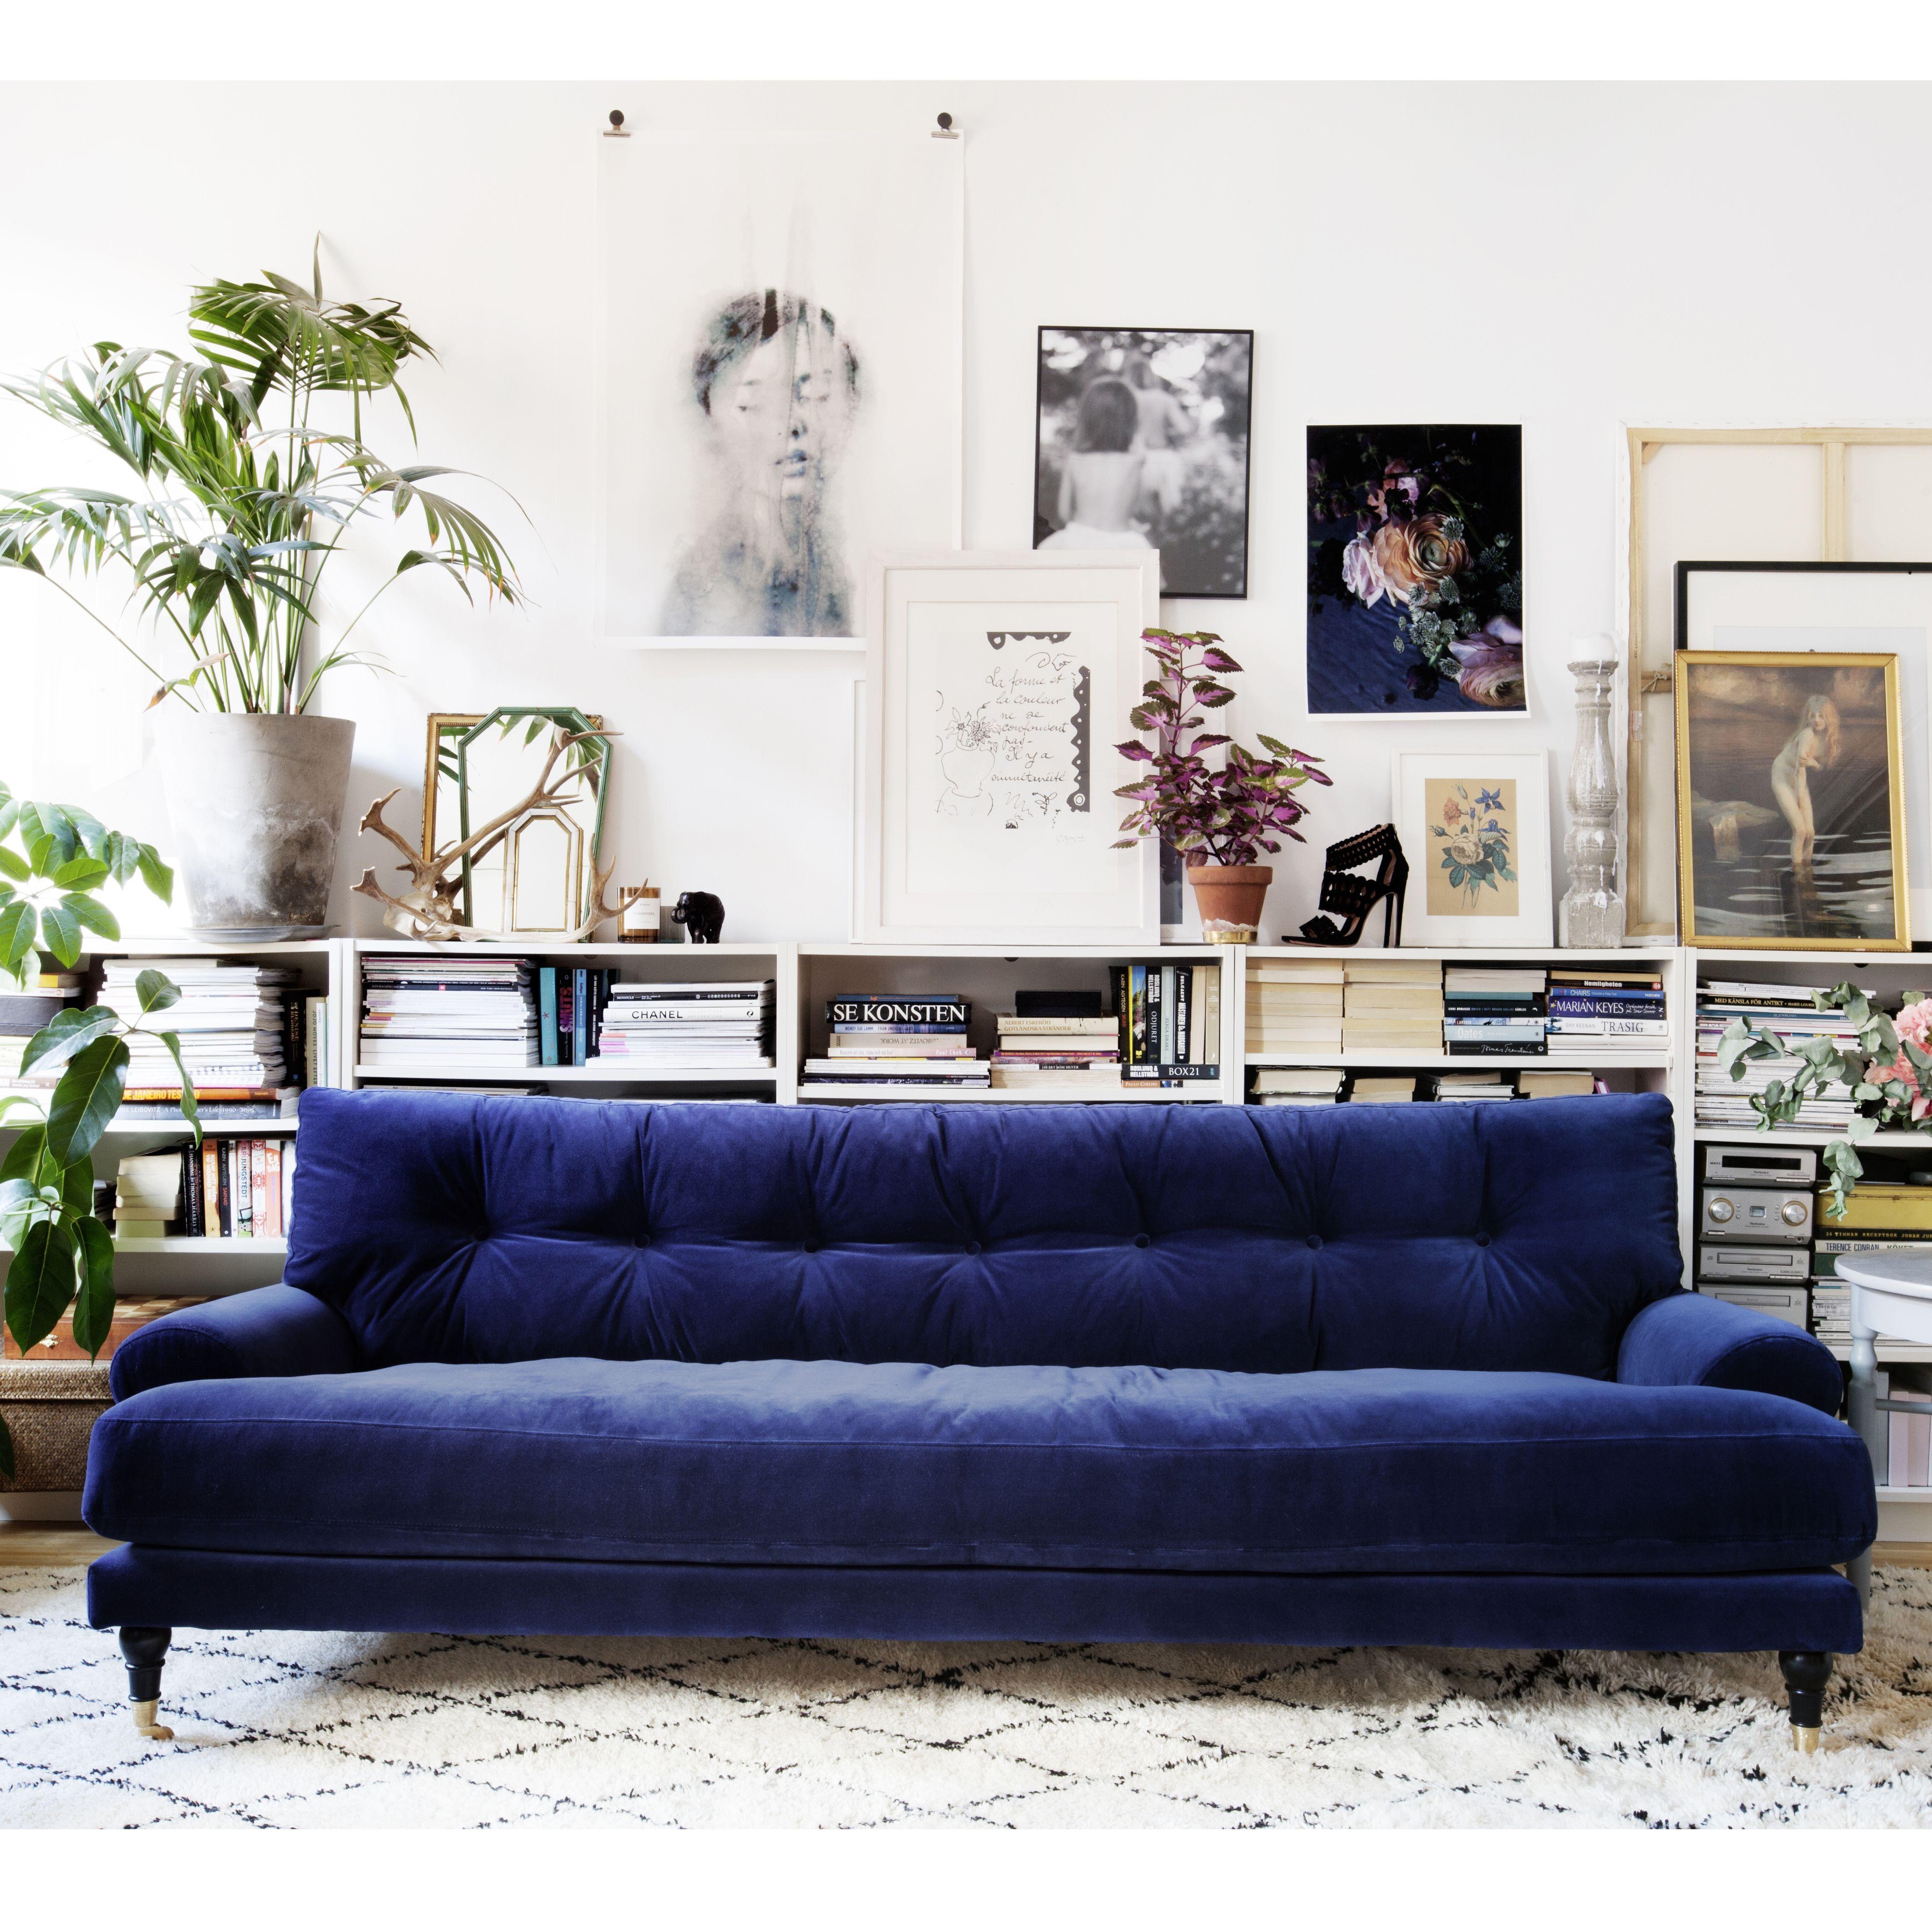 11 Radiant Upholstery Furniture Design Ideas Room Decor Dream Decor Living Room Sofa